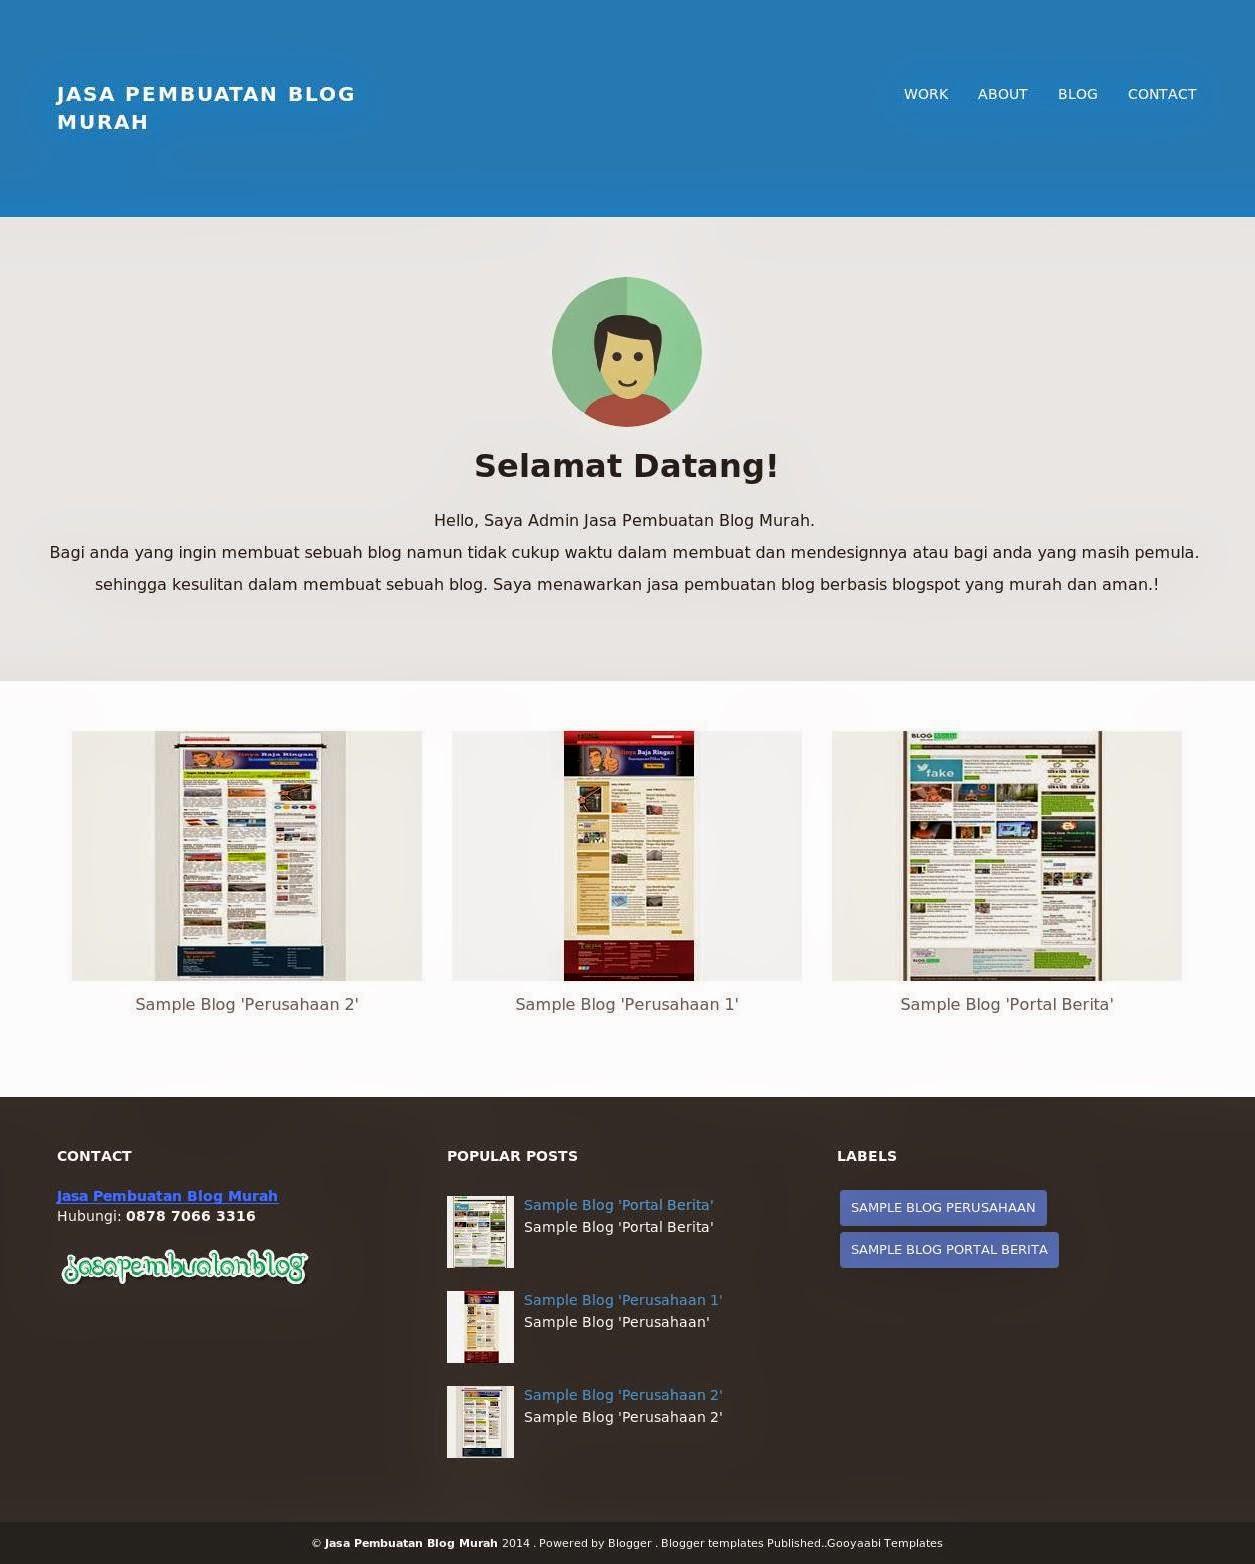 Sample Blog 'Portfolio'